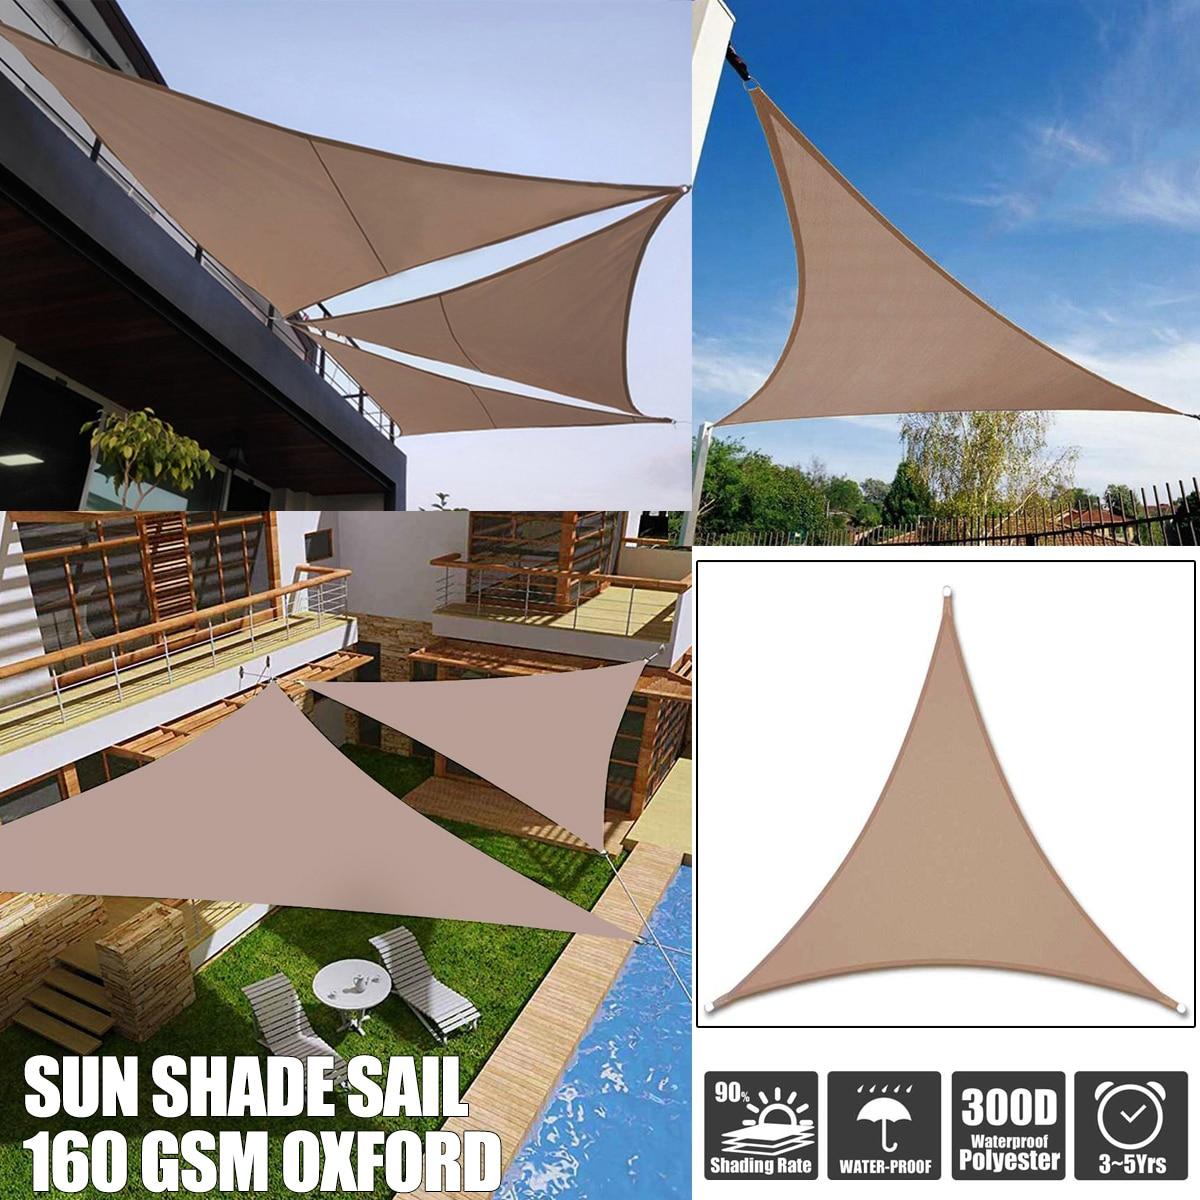 Toldo de poliéster impermeable 300D 3x 3/4x 4/5x 5/6x6m 8 tamaños caqui Regular triángulo sombra toldo jardín refugio al aire libre